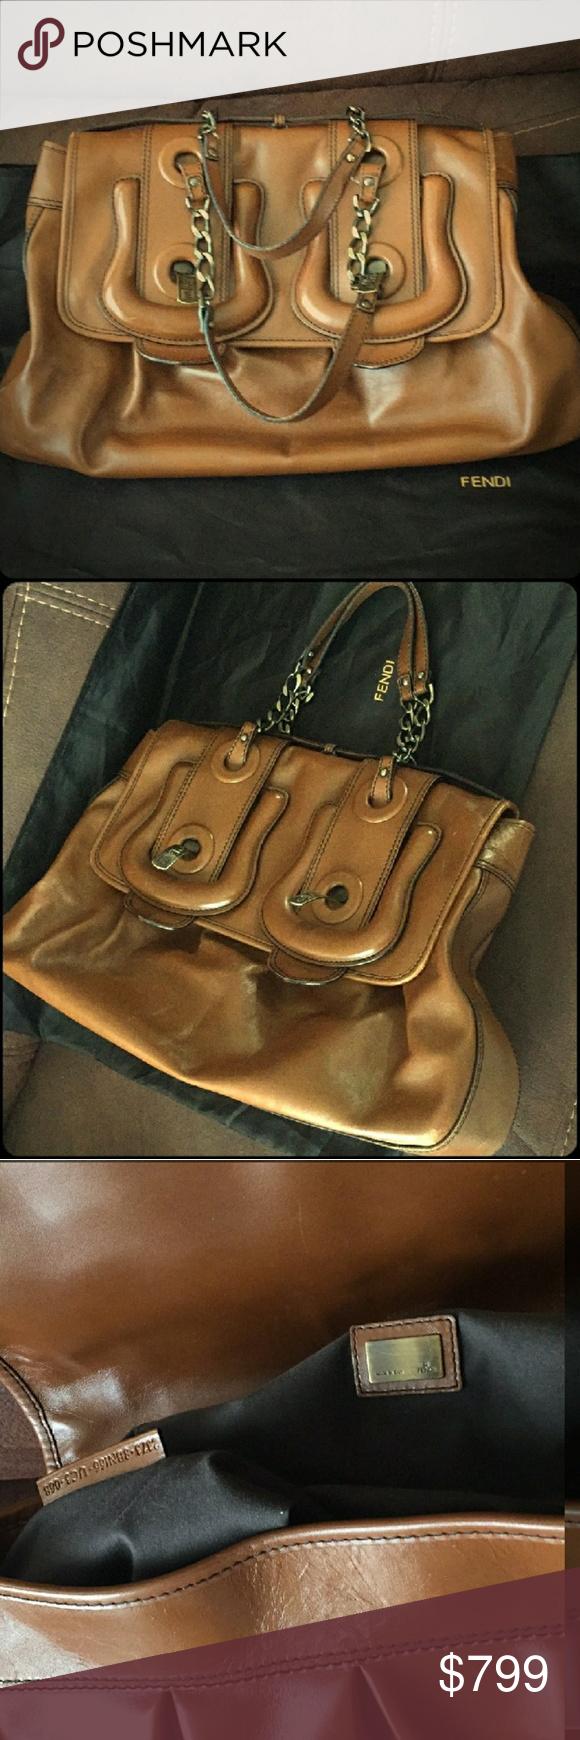 c9987d3fa2c5 XL FENDI NAPPA B buckle bag vernice calfskin The iconic Fenfi B bag in  jumbo size Nappa Vernice calfskin beautiful camel tan color absolutely  GORGEOUS!